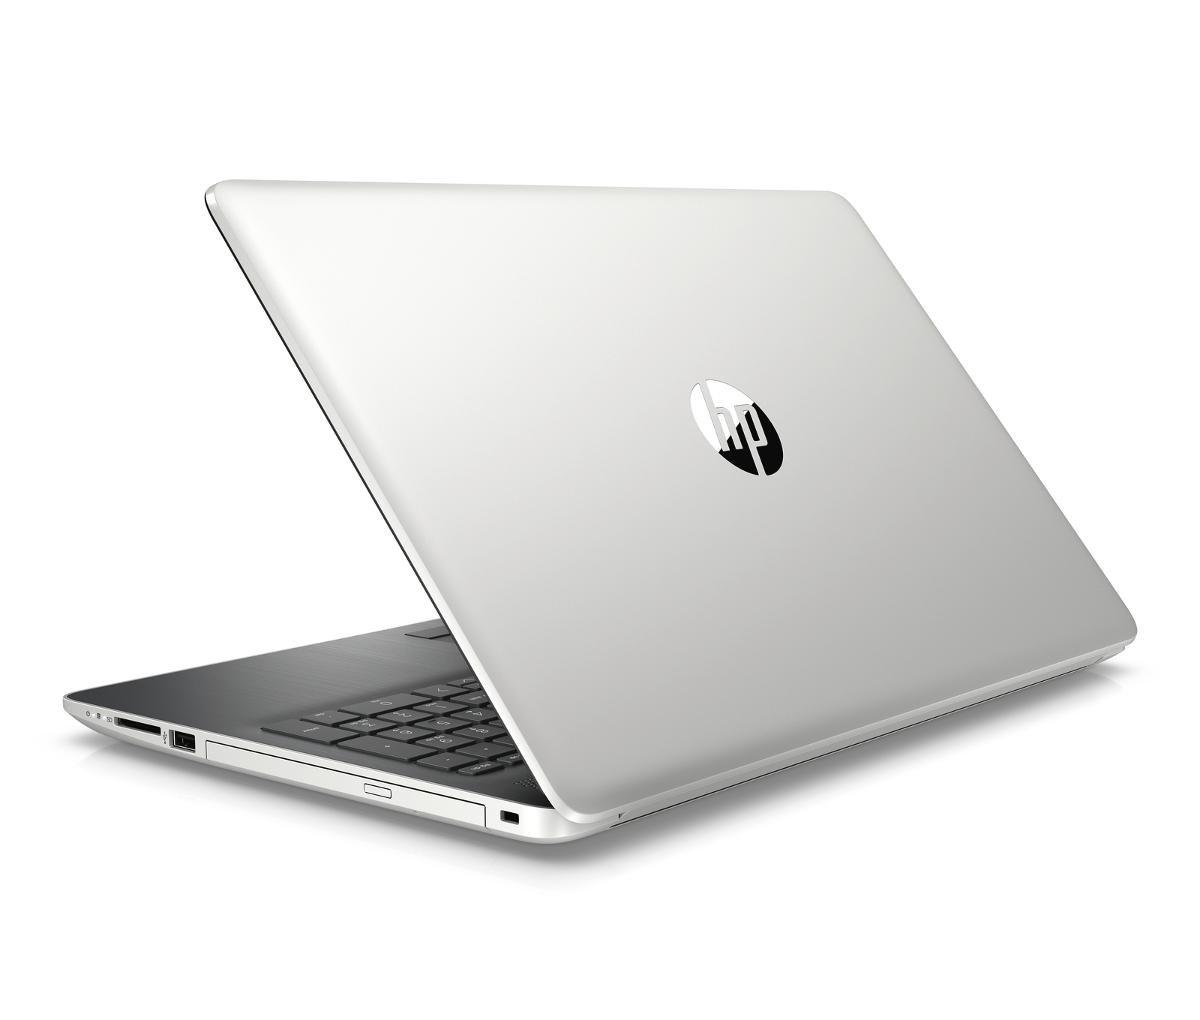 "Laptop HP 15-db0003nw 4UE98EA, Ryzen 5 2500U, 8 GB RAM, 15.6"", 1 TB, Windows 10 Home"